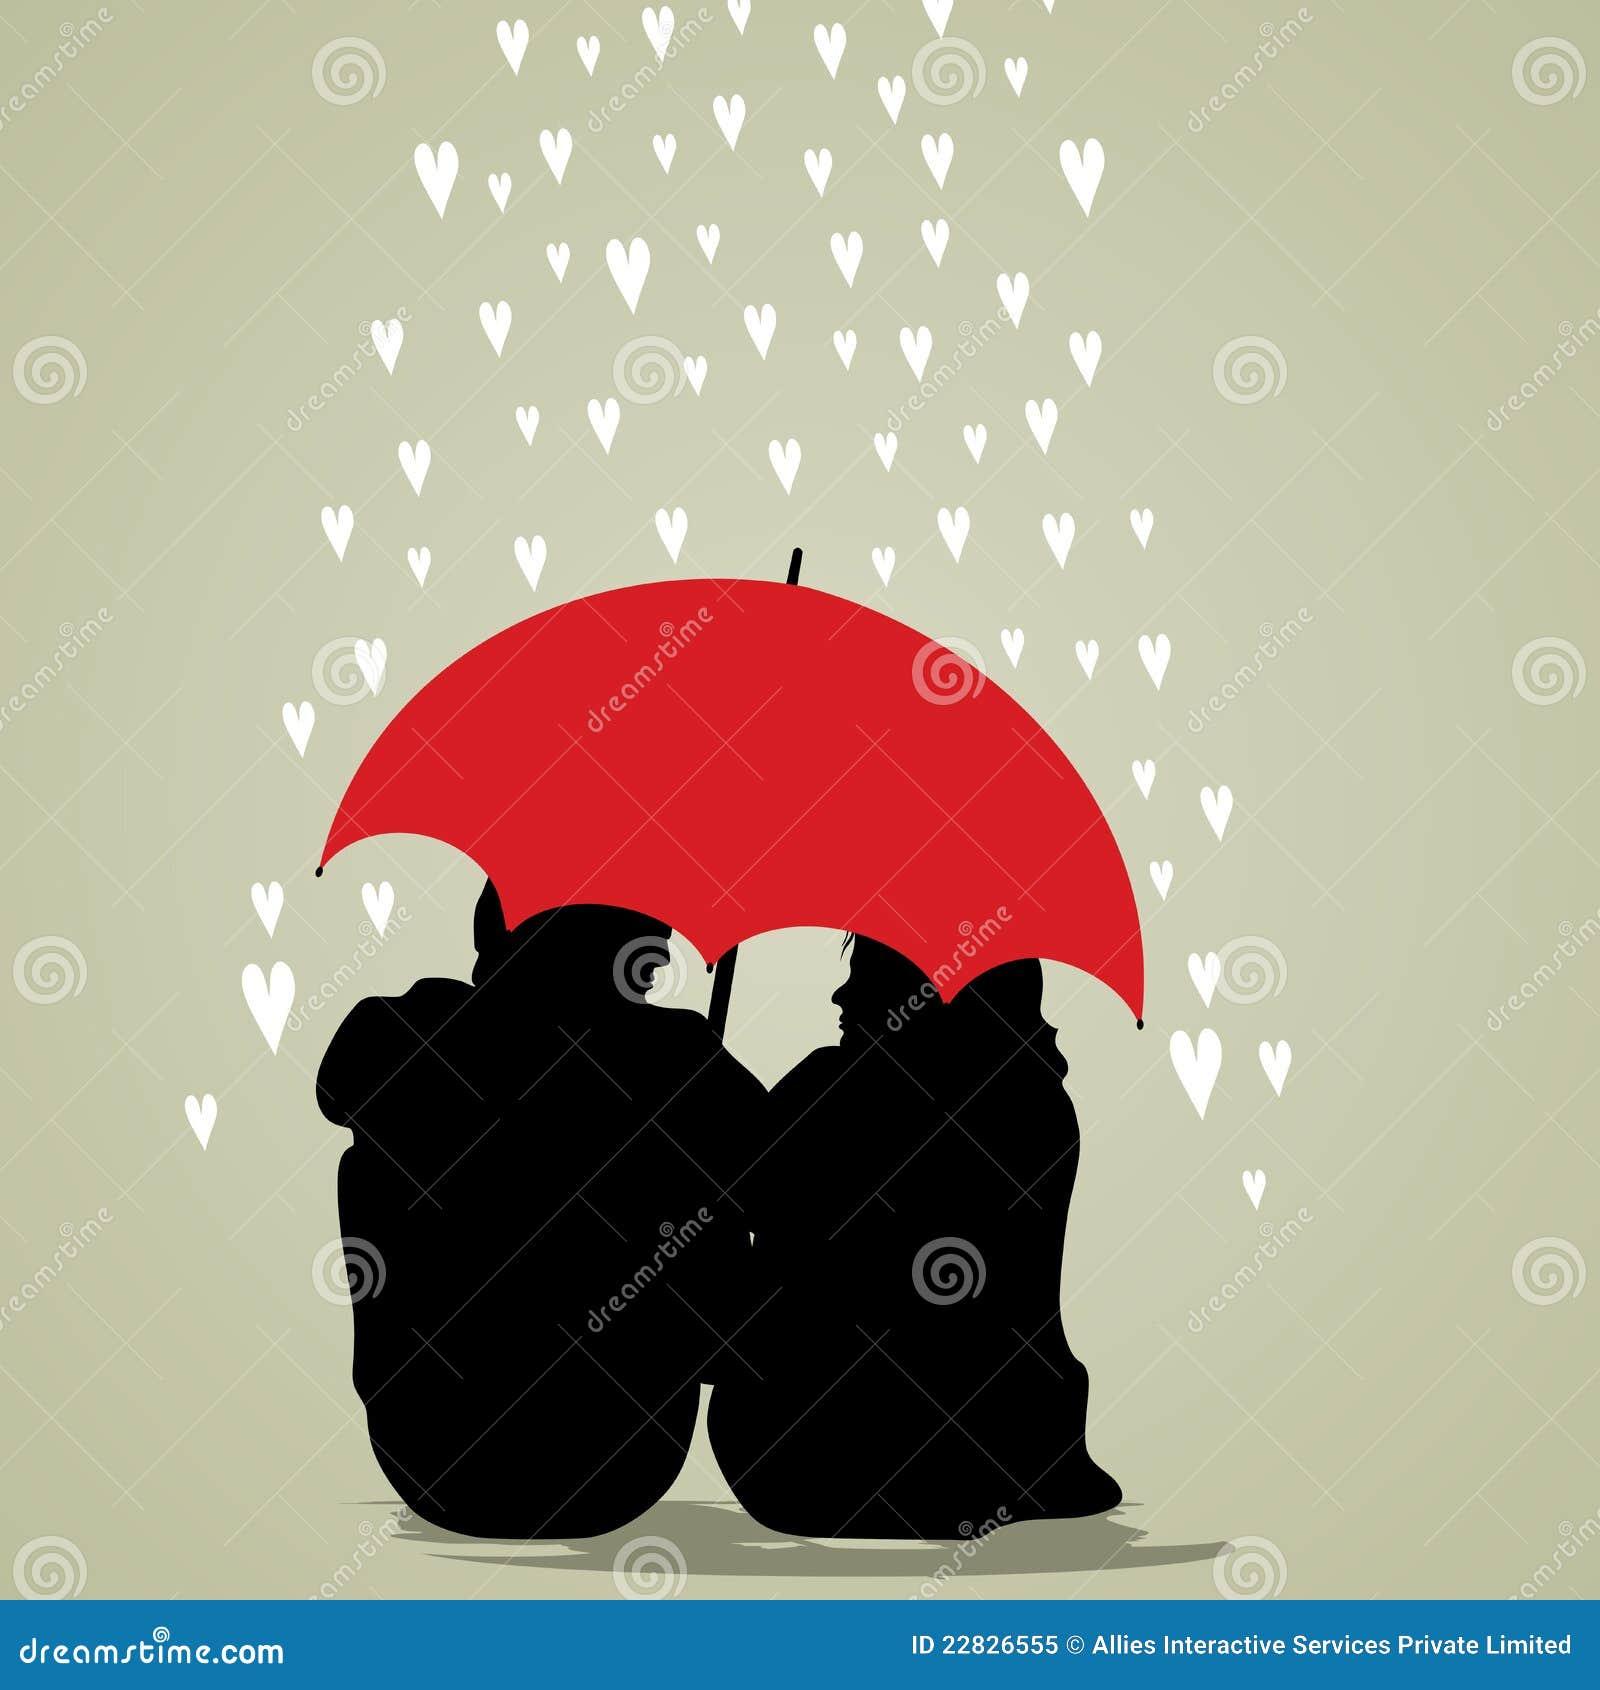 Silhouette Couple Under Umbrella Couple under umbrella on rainy